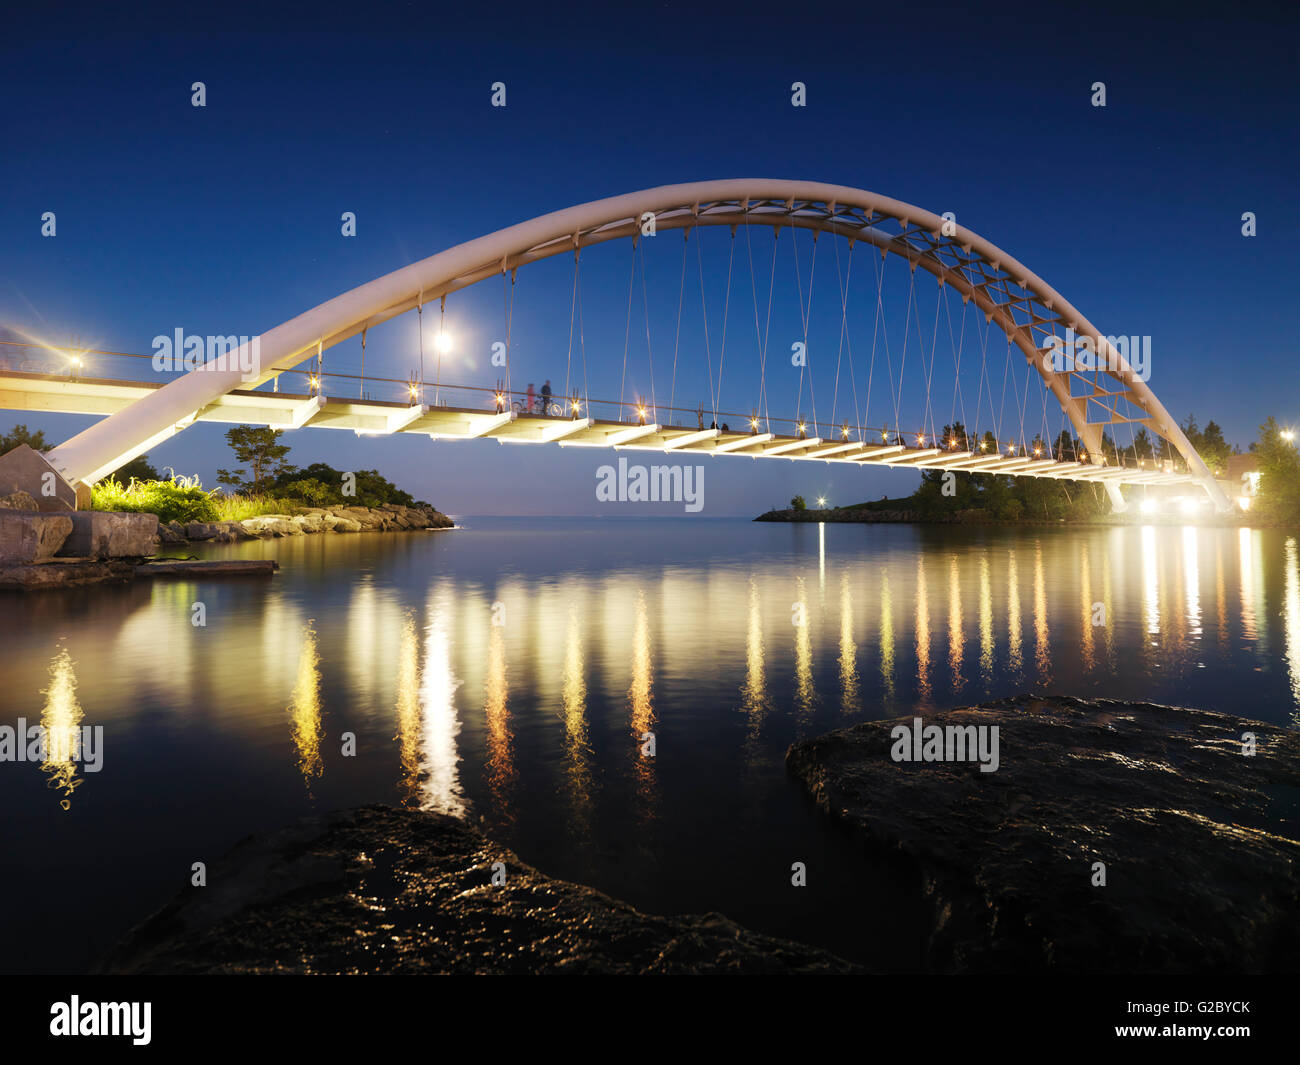 Humber River Arch Bridge bei Nacht, Toronto, Provinz Ontario, Kanada Stockfoto